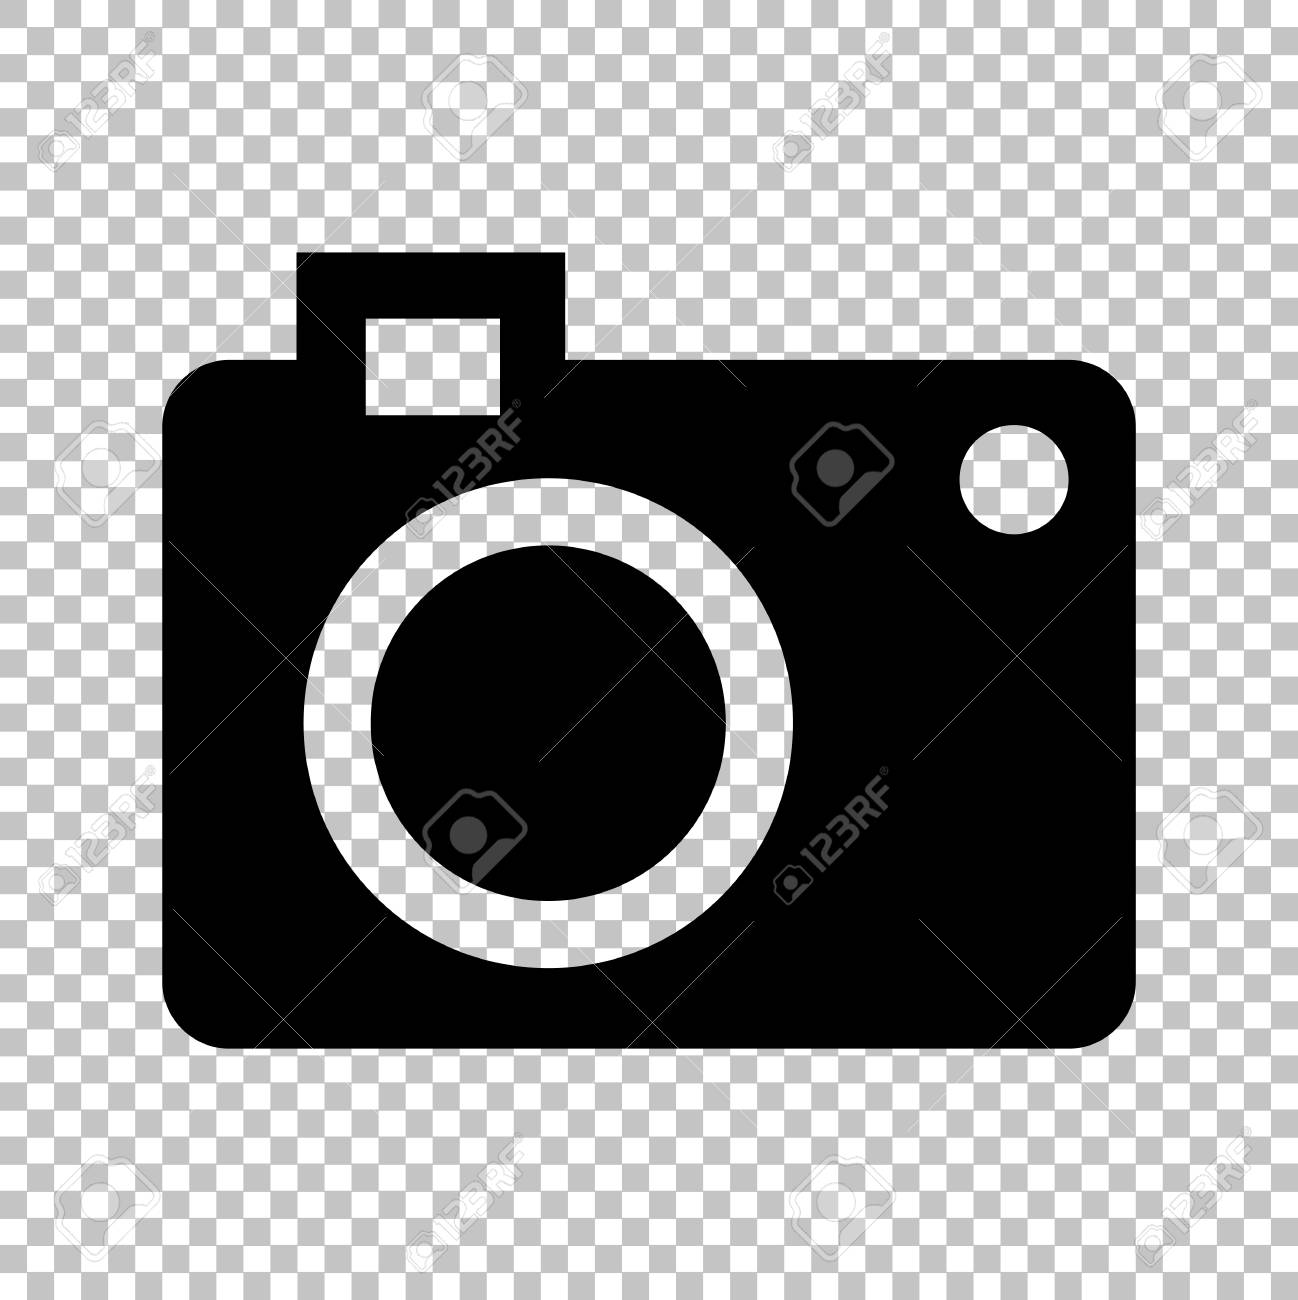 digital camera icon flat style icon on transparent background